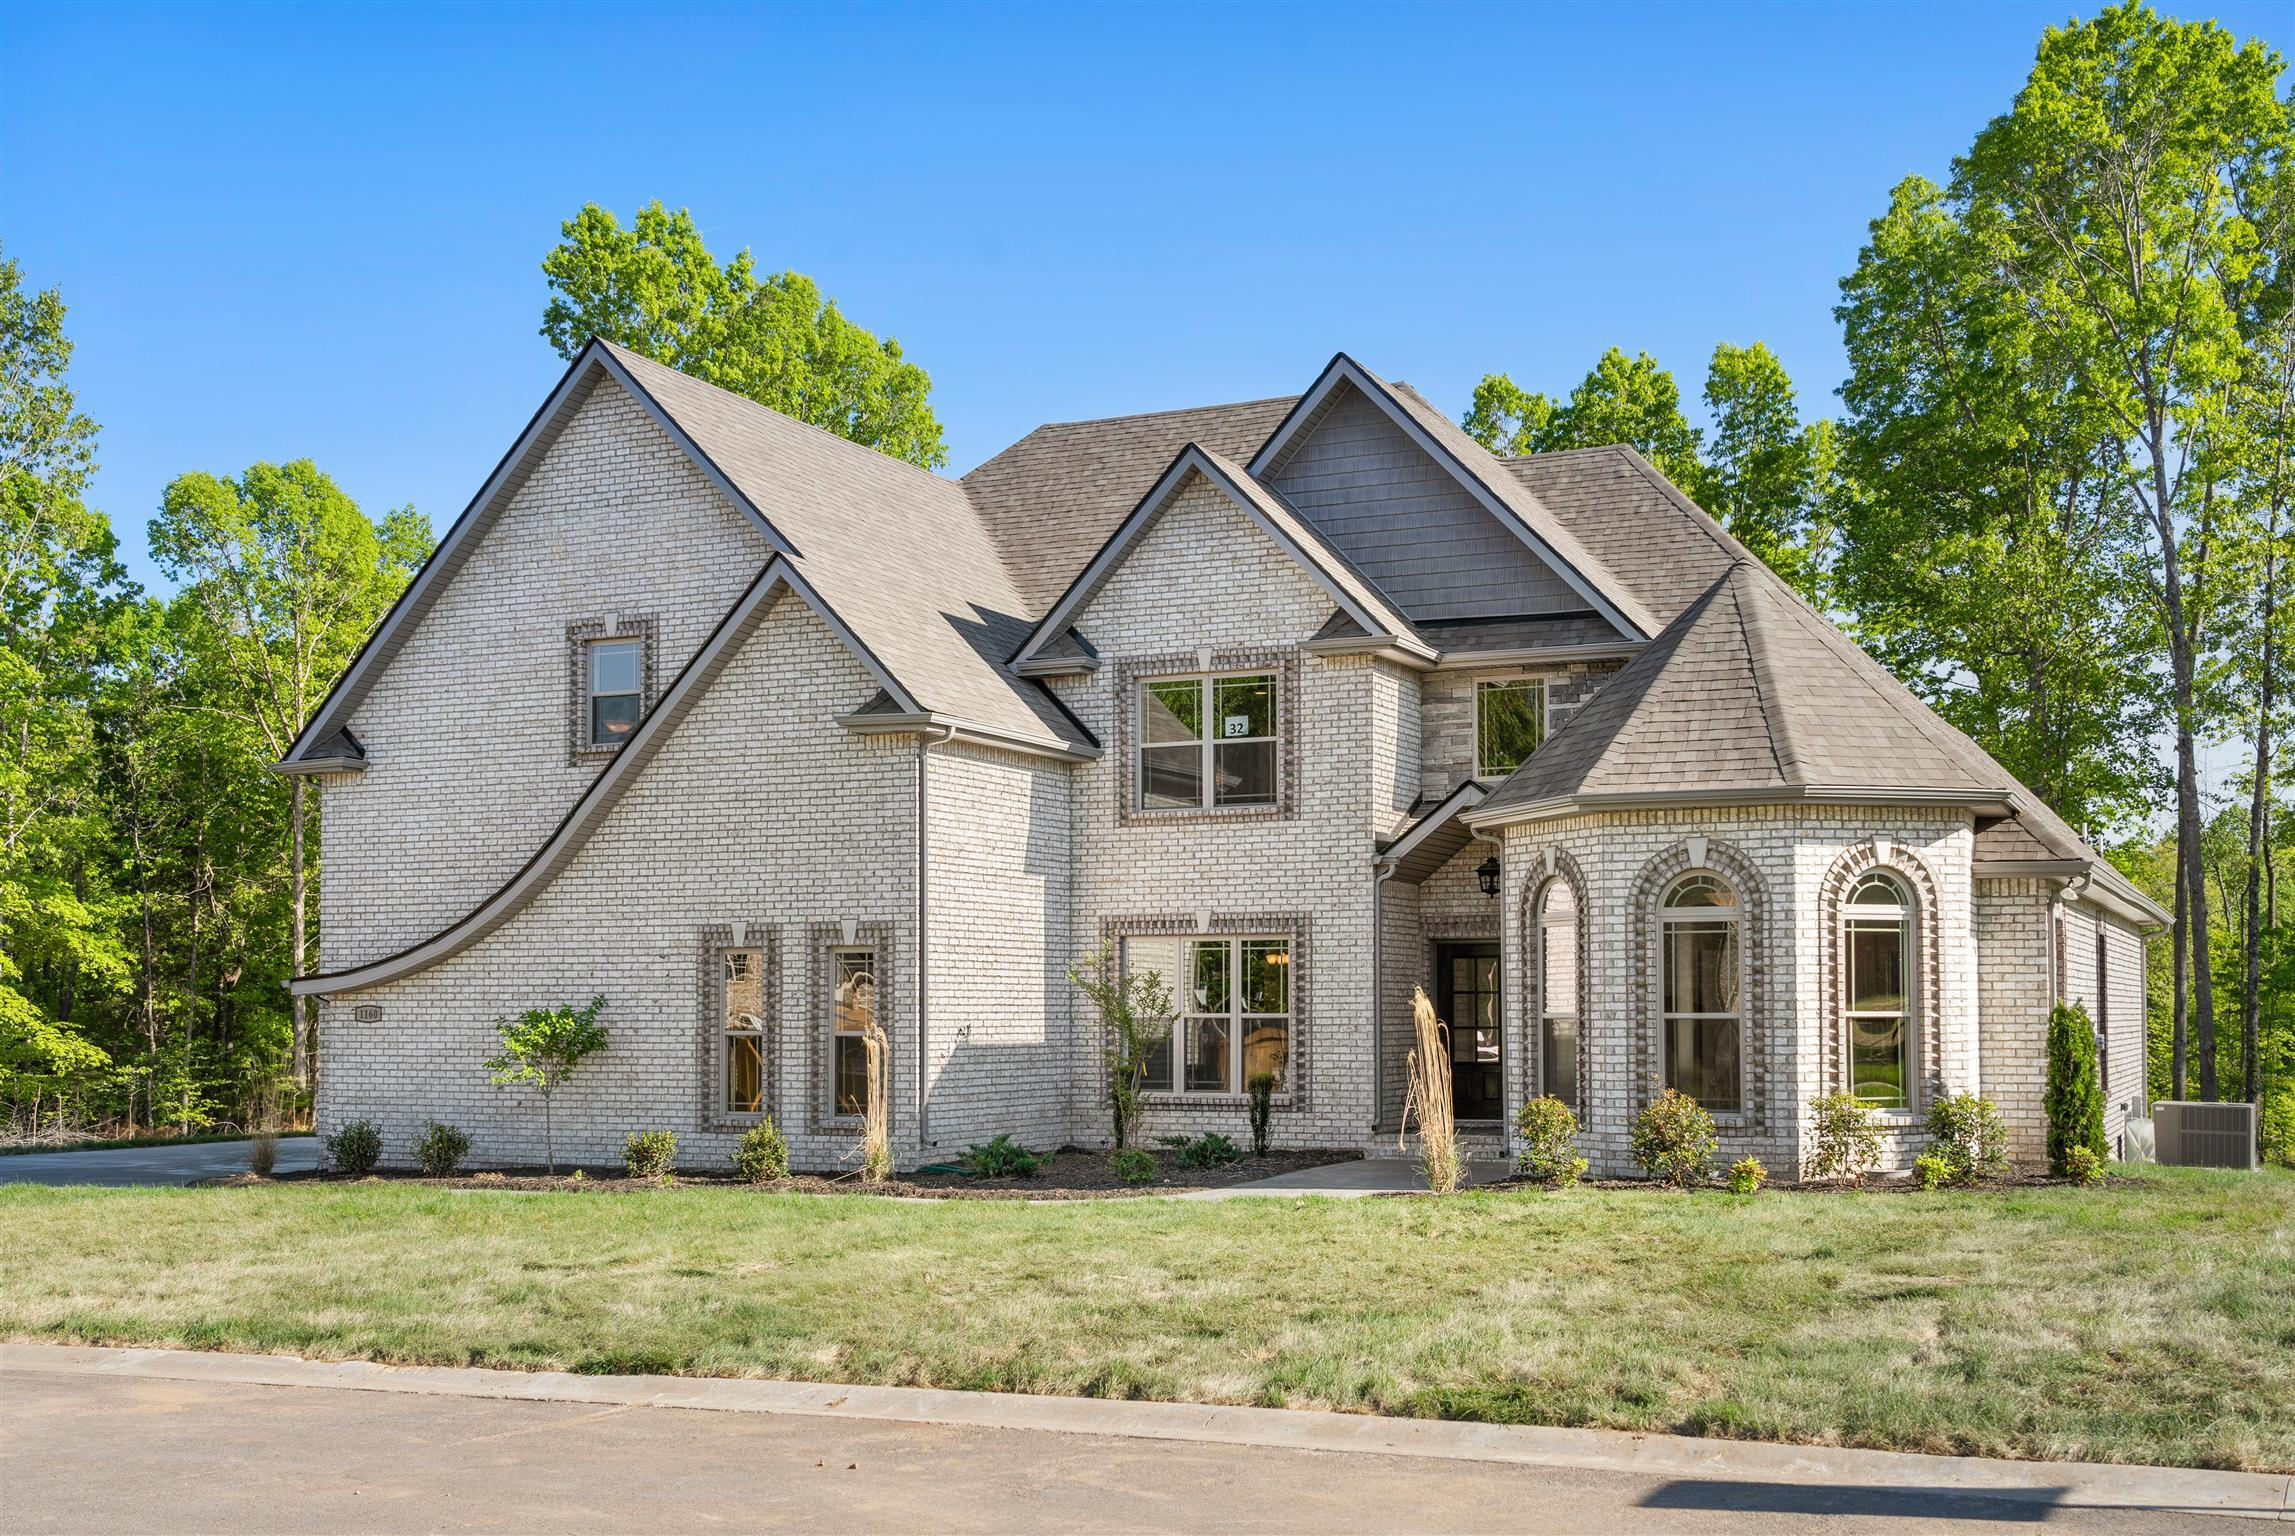 1160 Reda Drive Lot 32, Clarksville, TN 37042 - Clarksville, TN real estate listing